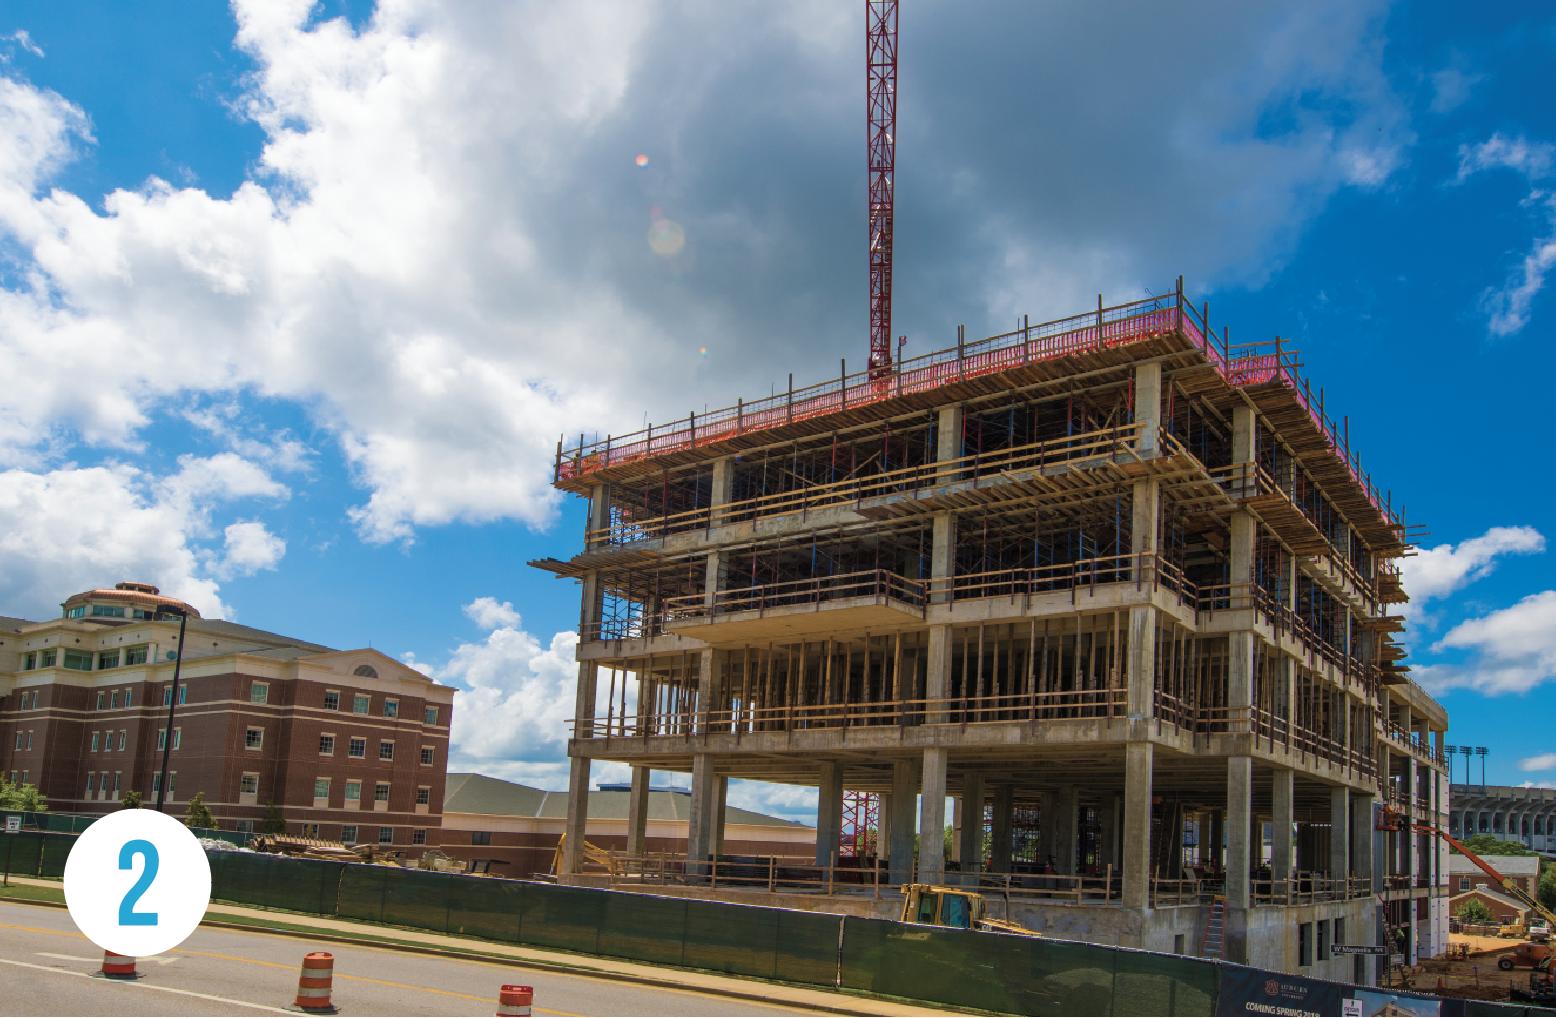 2 Harbert College Graduate Building under construction